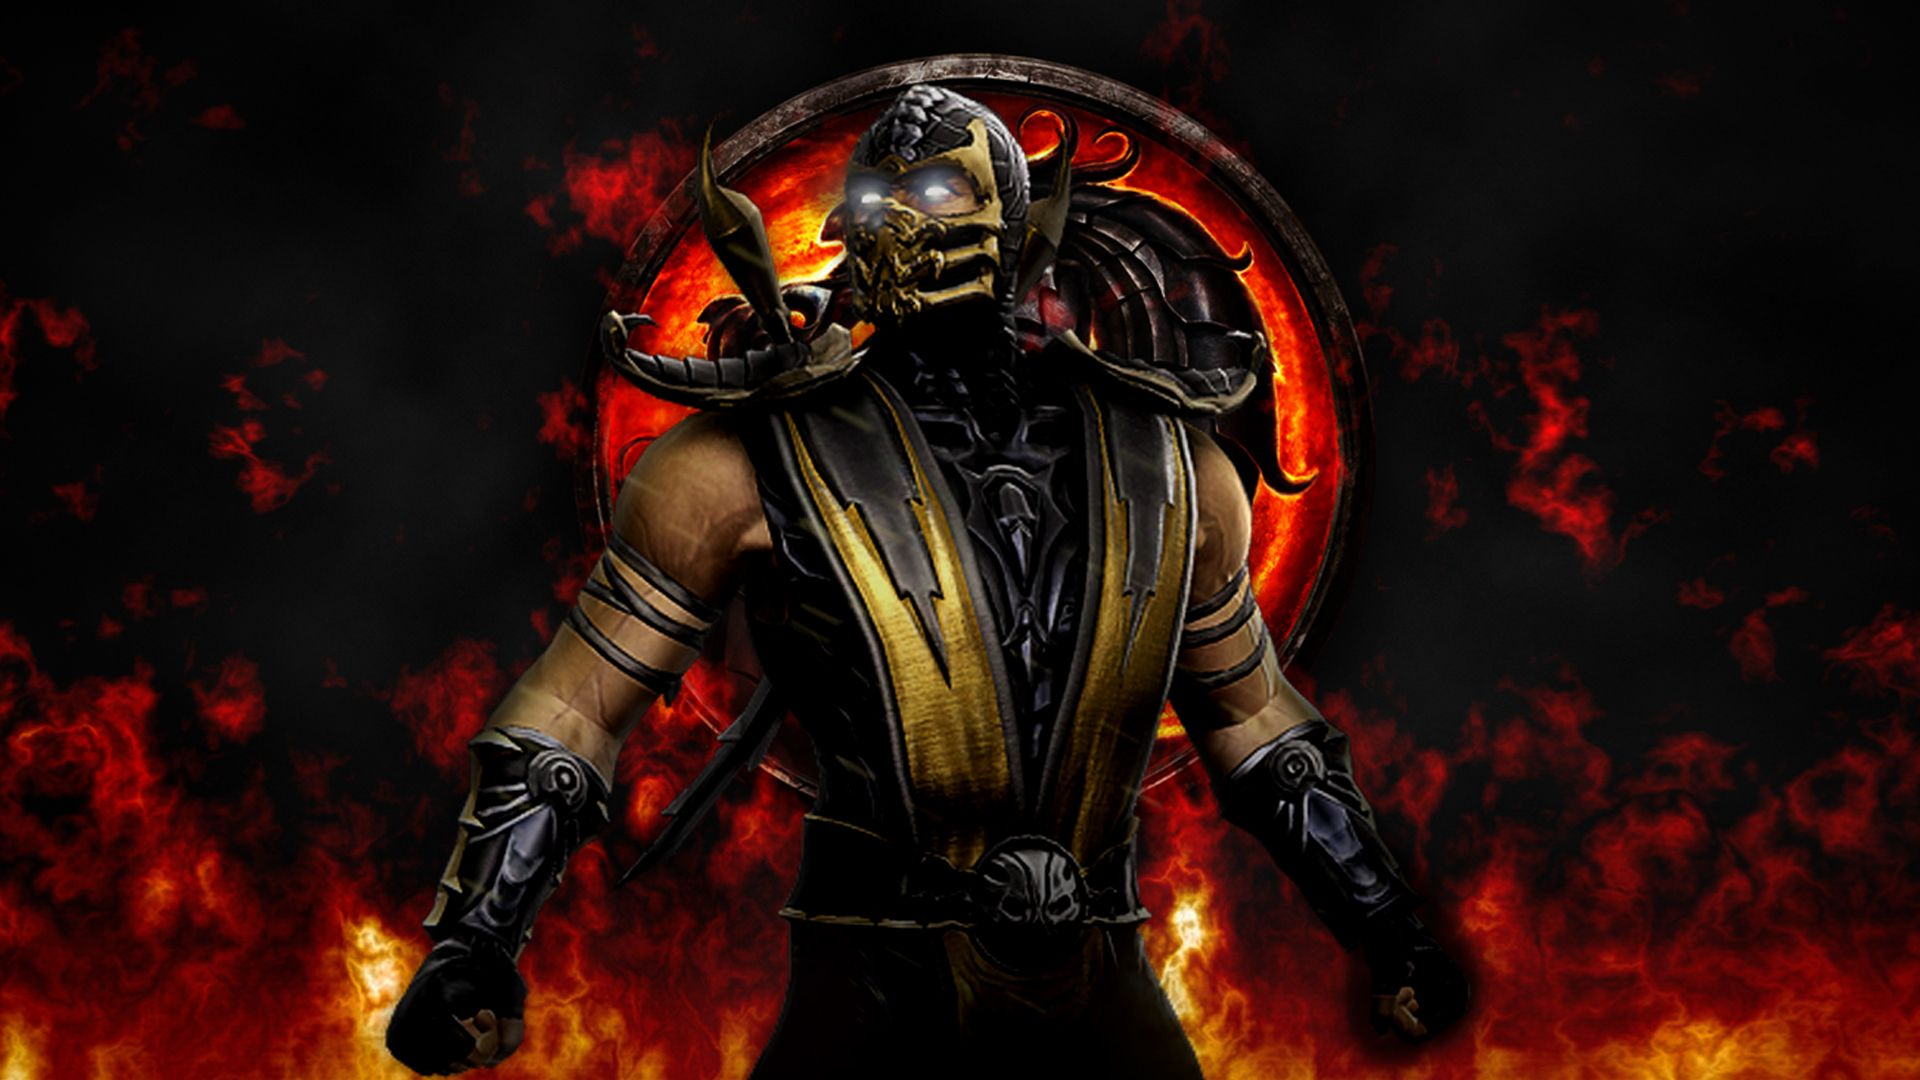 Scorpion Mortal Kombat X Wallpaper Posted By Sarah Tremblay